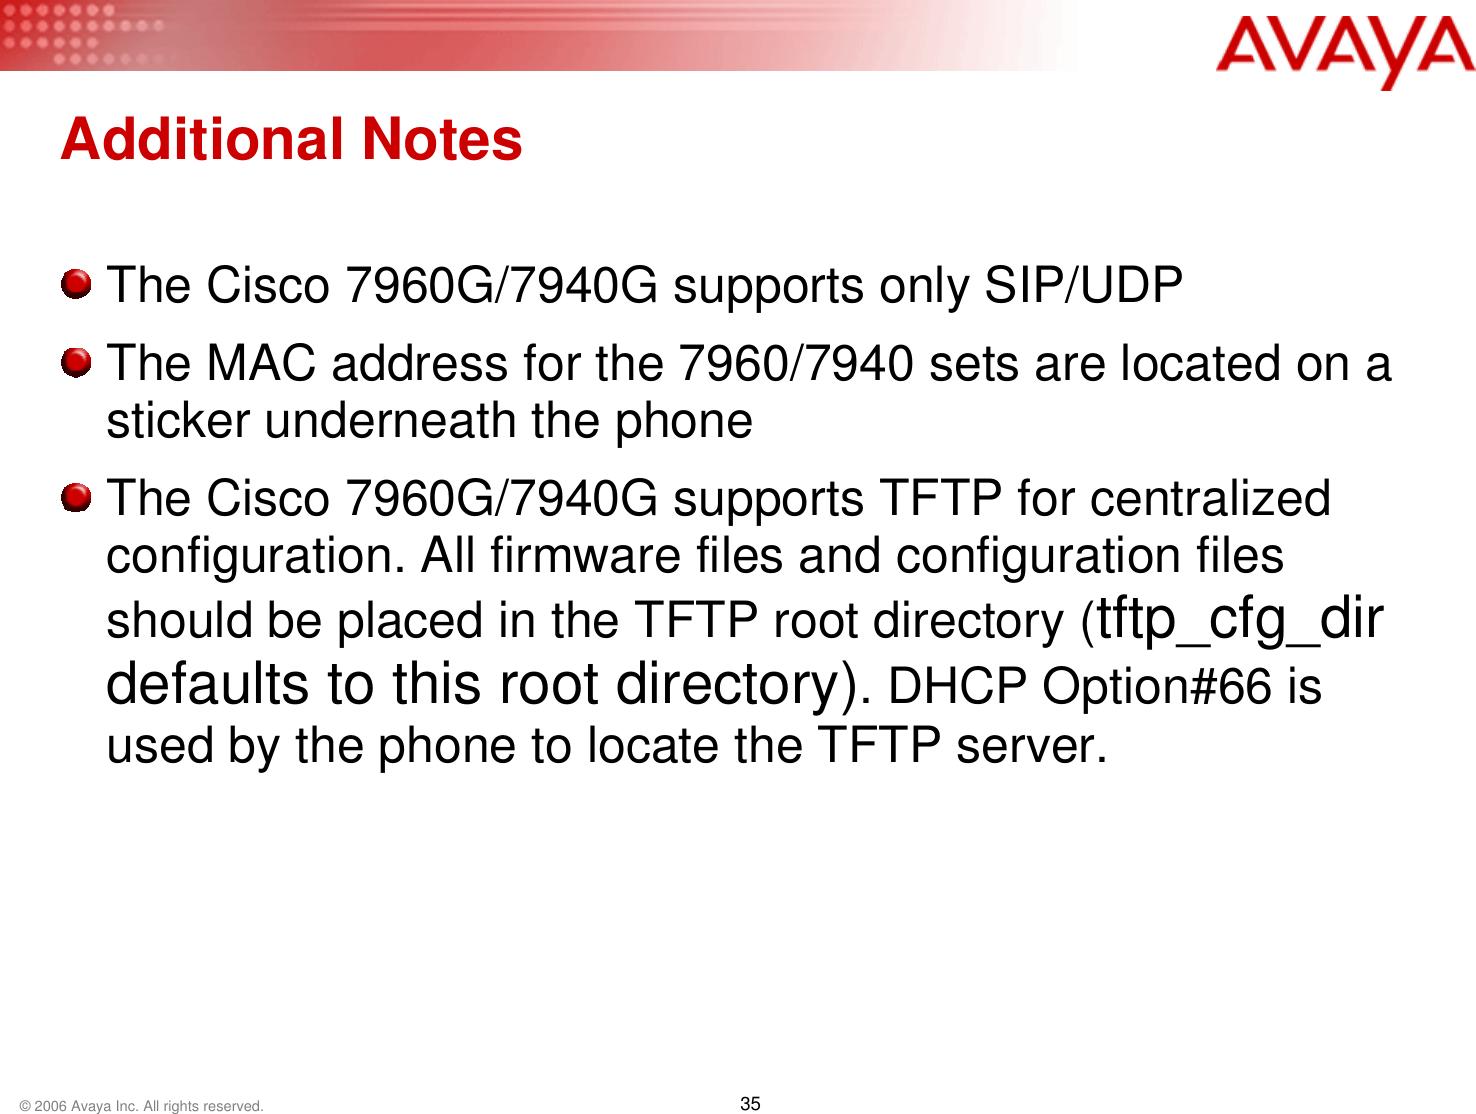 Belgacom 7940 Configuring A Cisco 7960/7940 SIP Phone For Use With